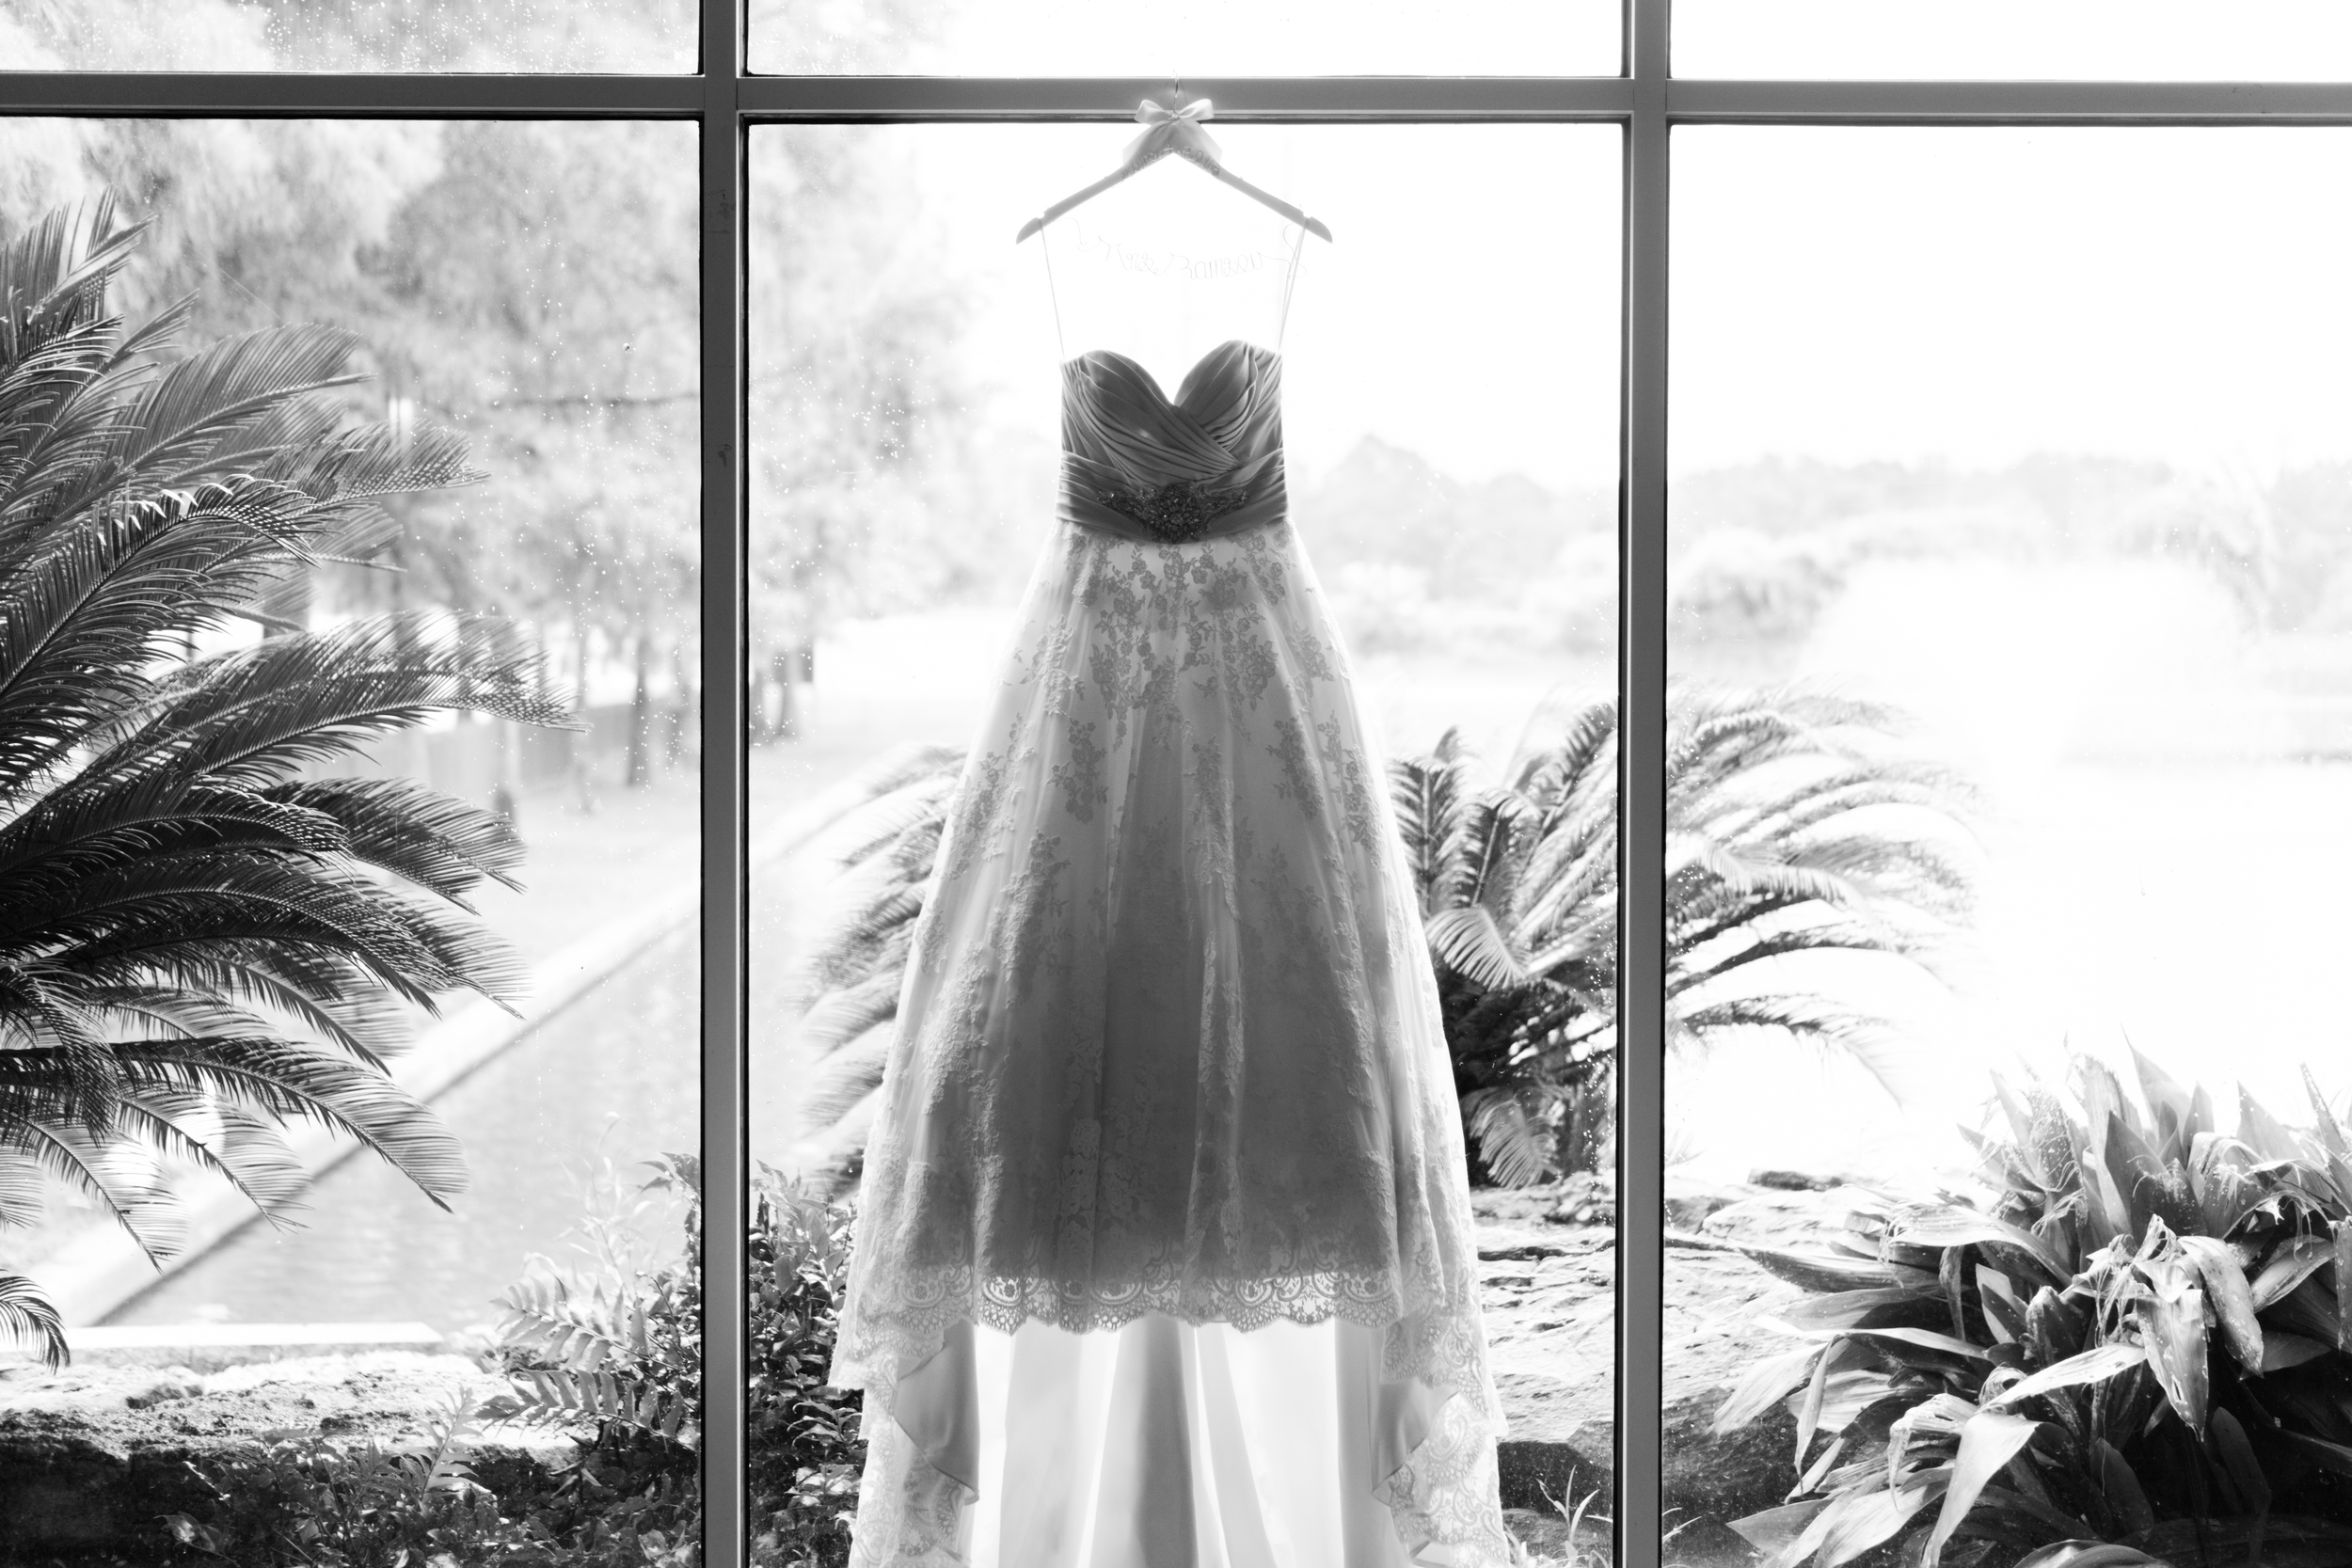 06-04-16_Ramsey_dress.jpg